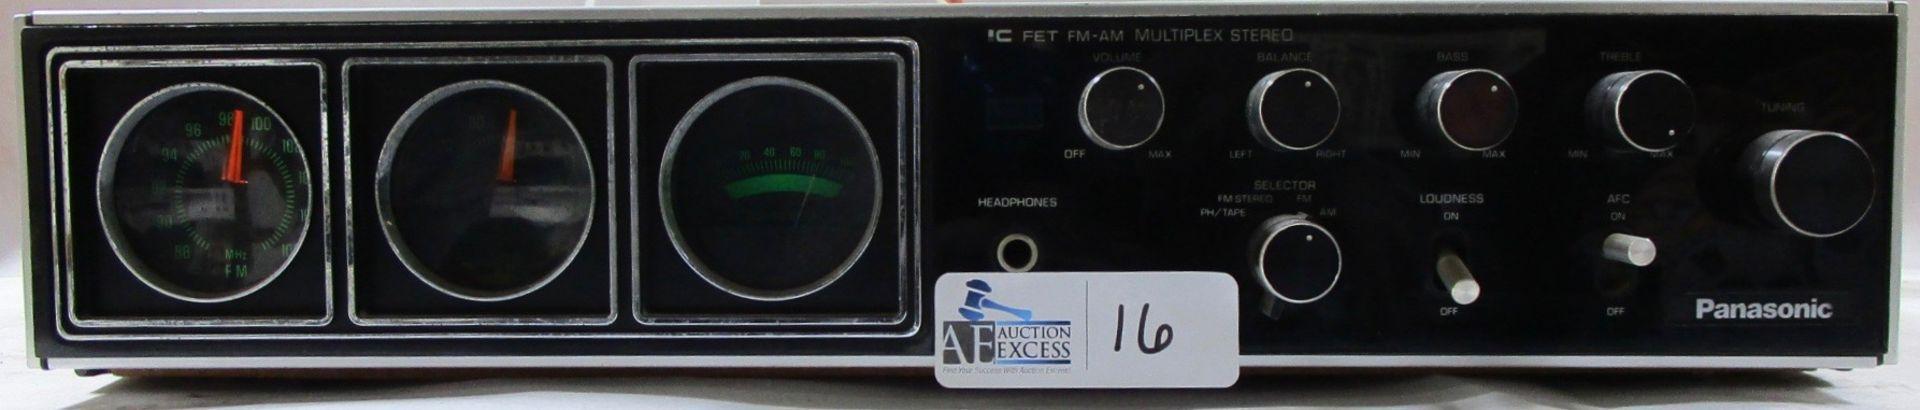 Lot 16 - PANASONIC RE-7680